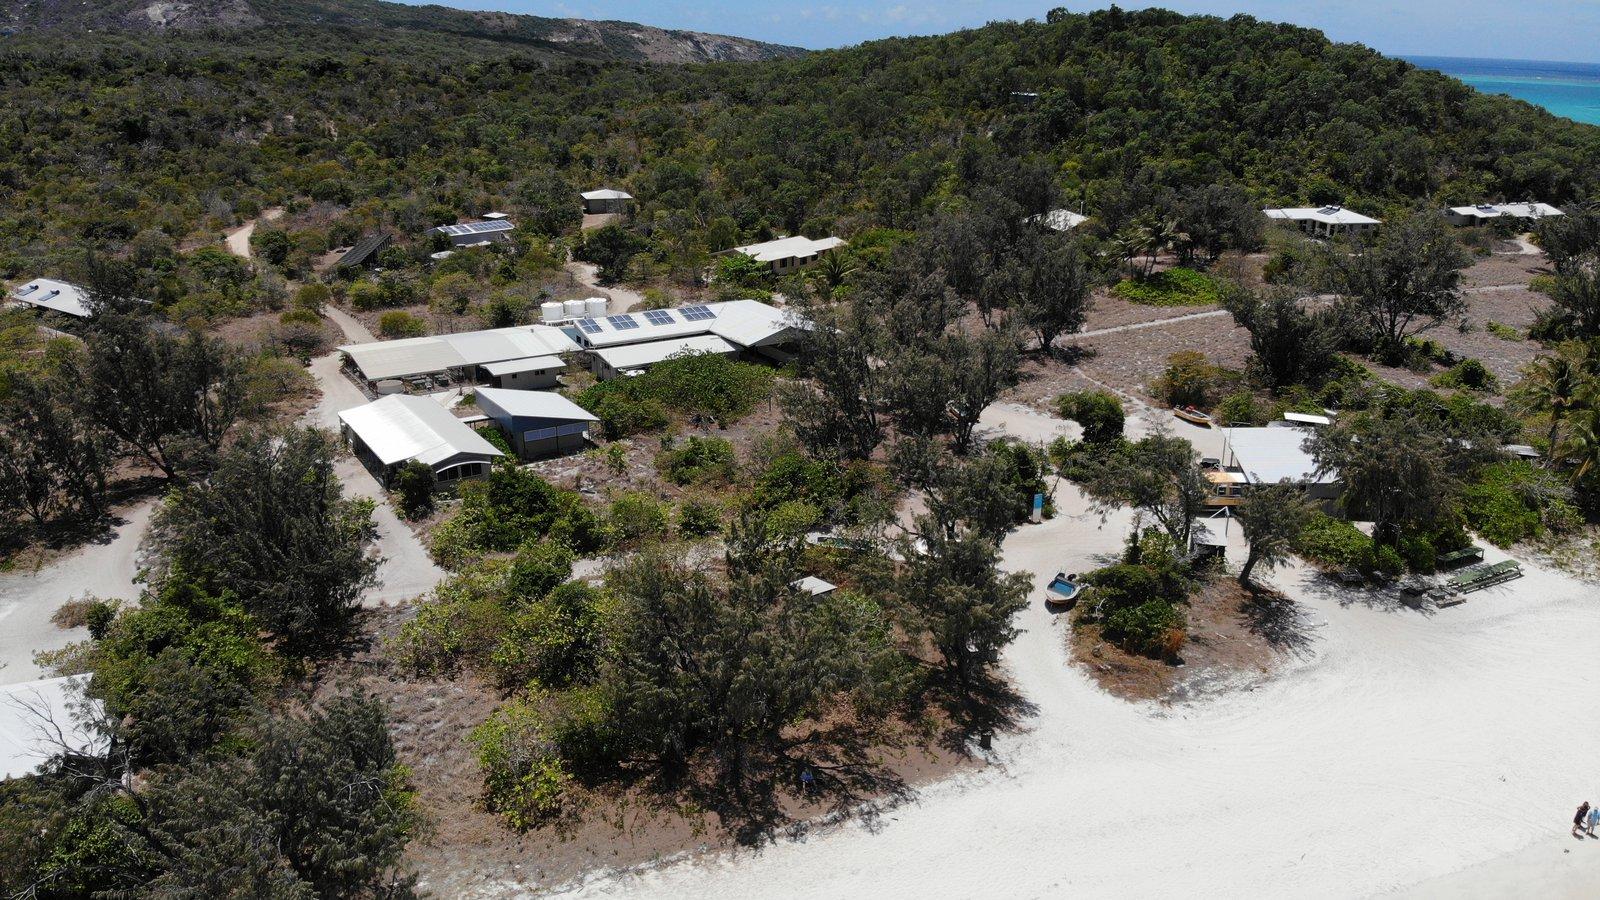 Lizard Island Research Station